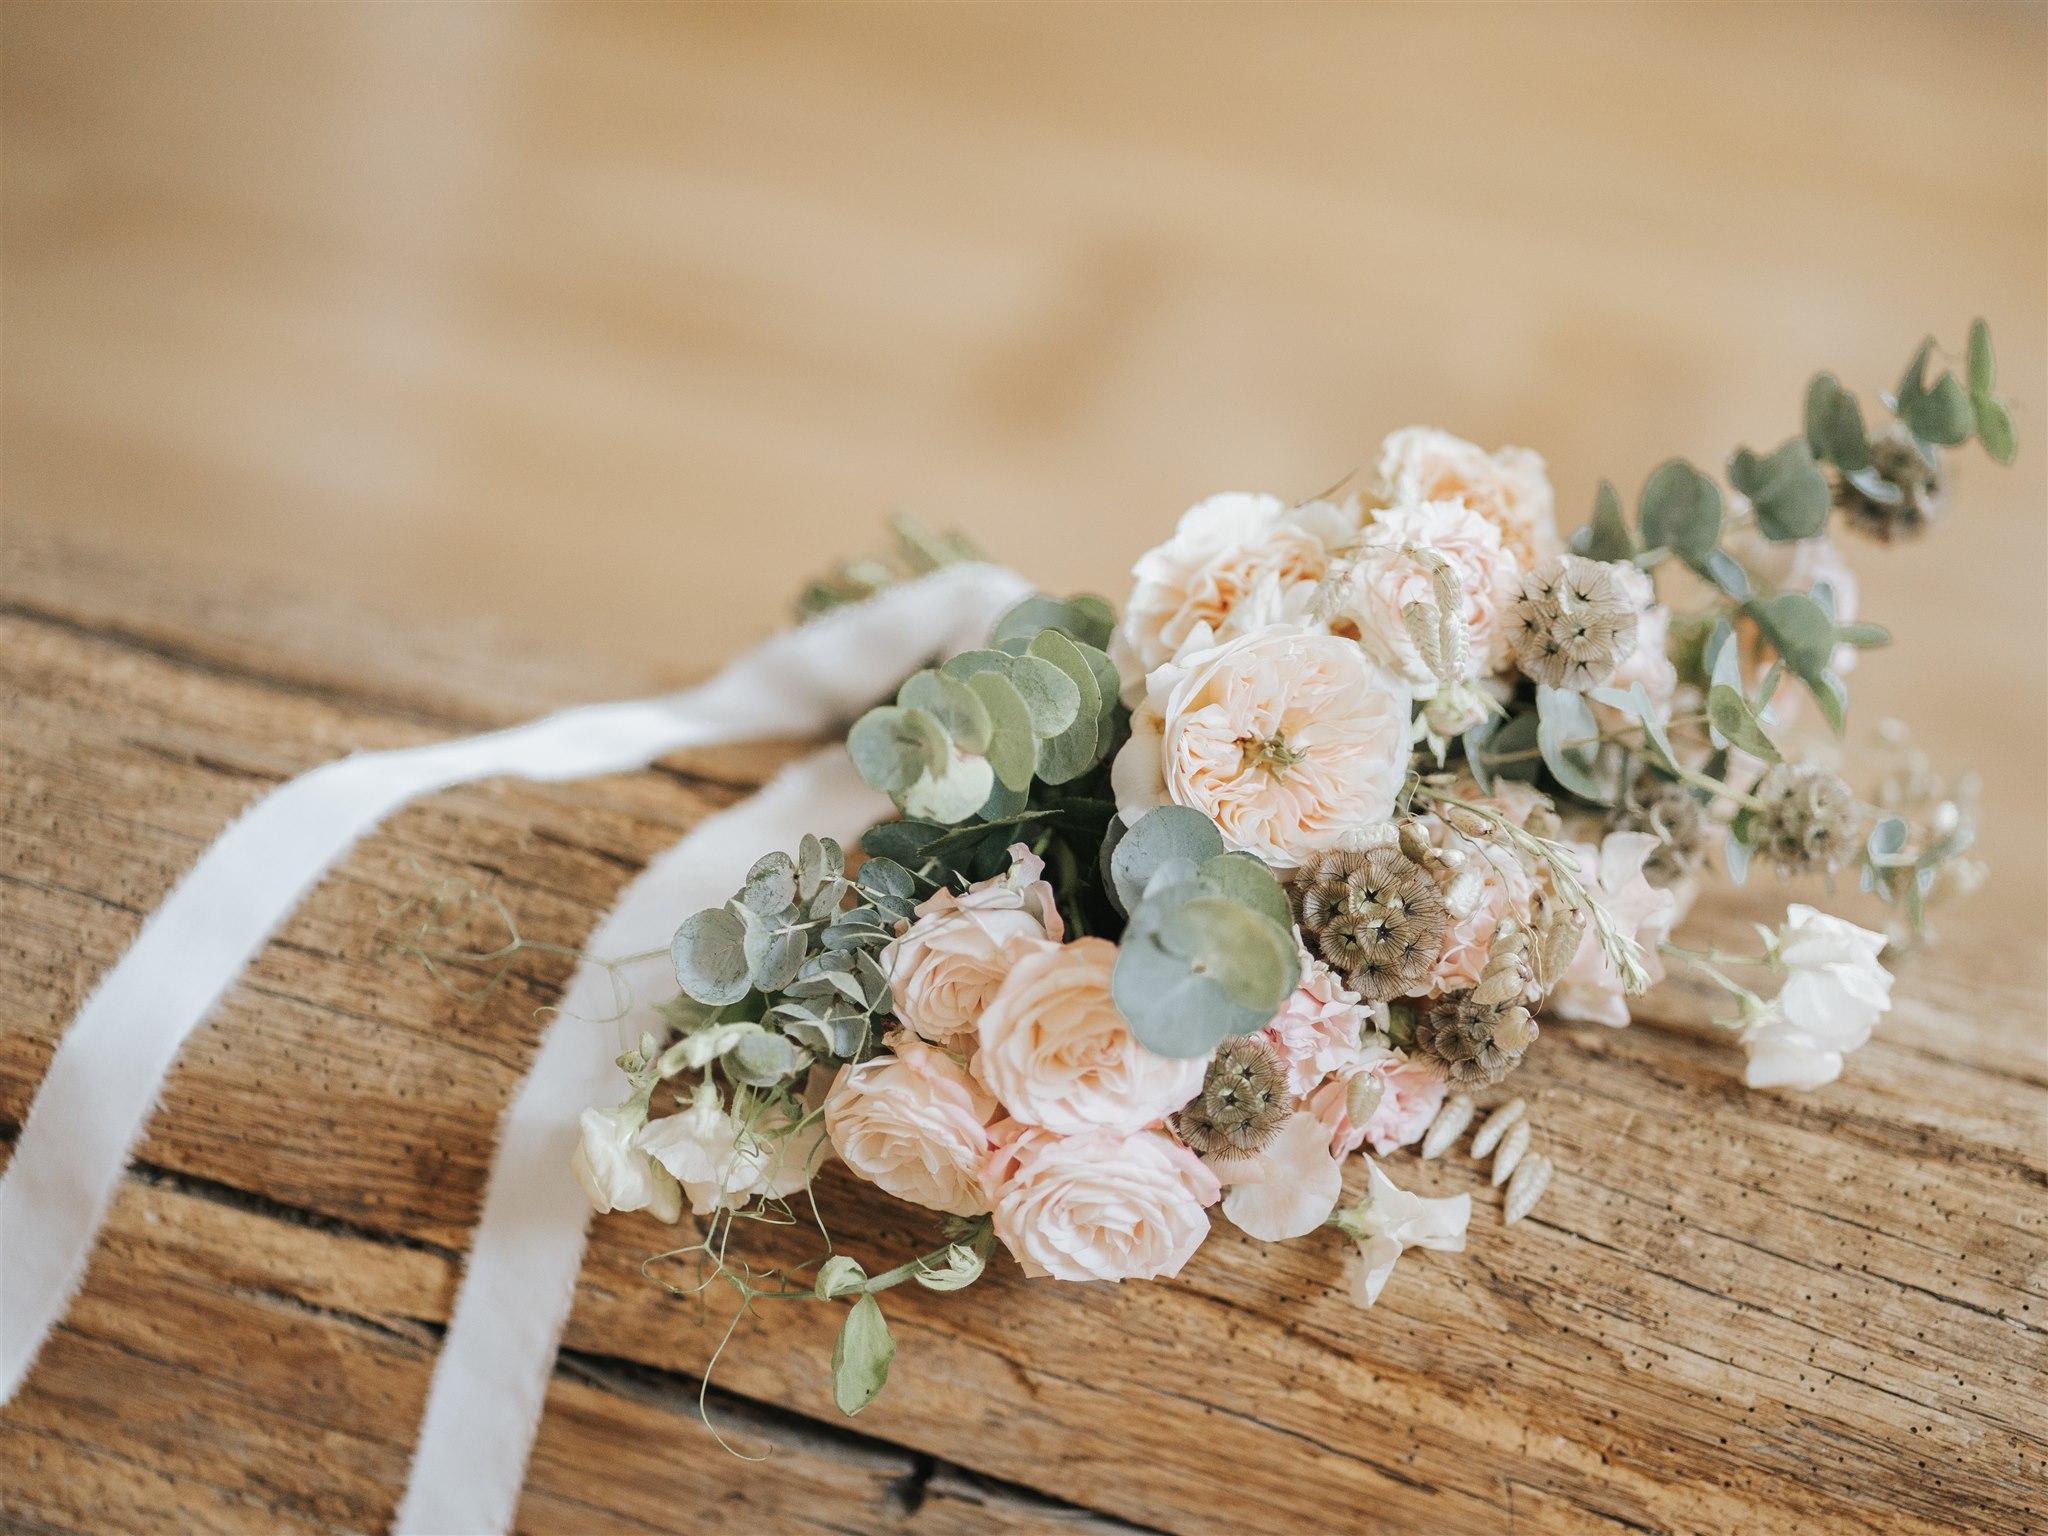 bouquet de mariée, mariage, fleuriste mariage, fleurs de mariage, atelier floral, floral designer, fleuriste Ile de France